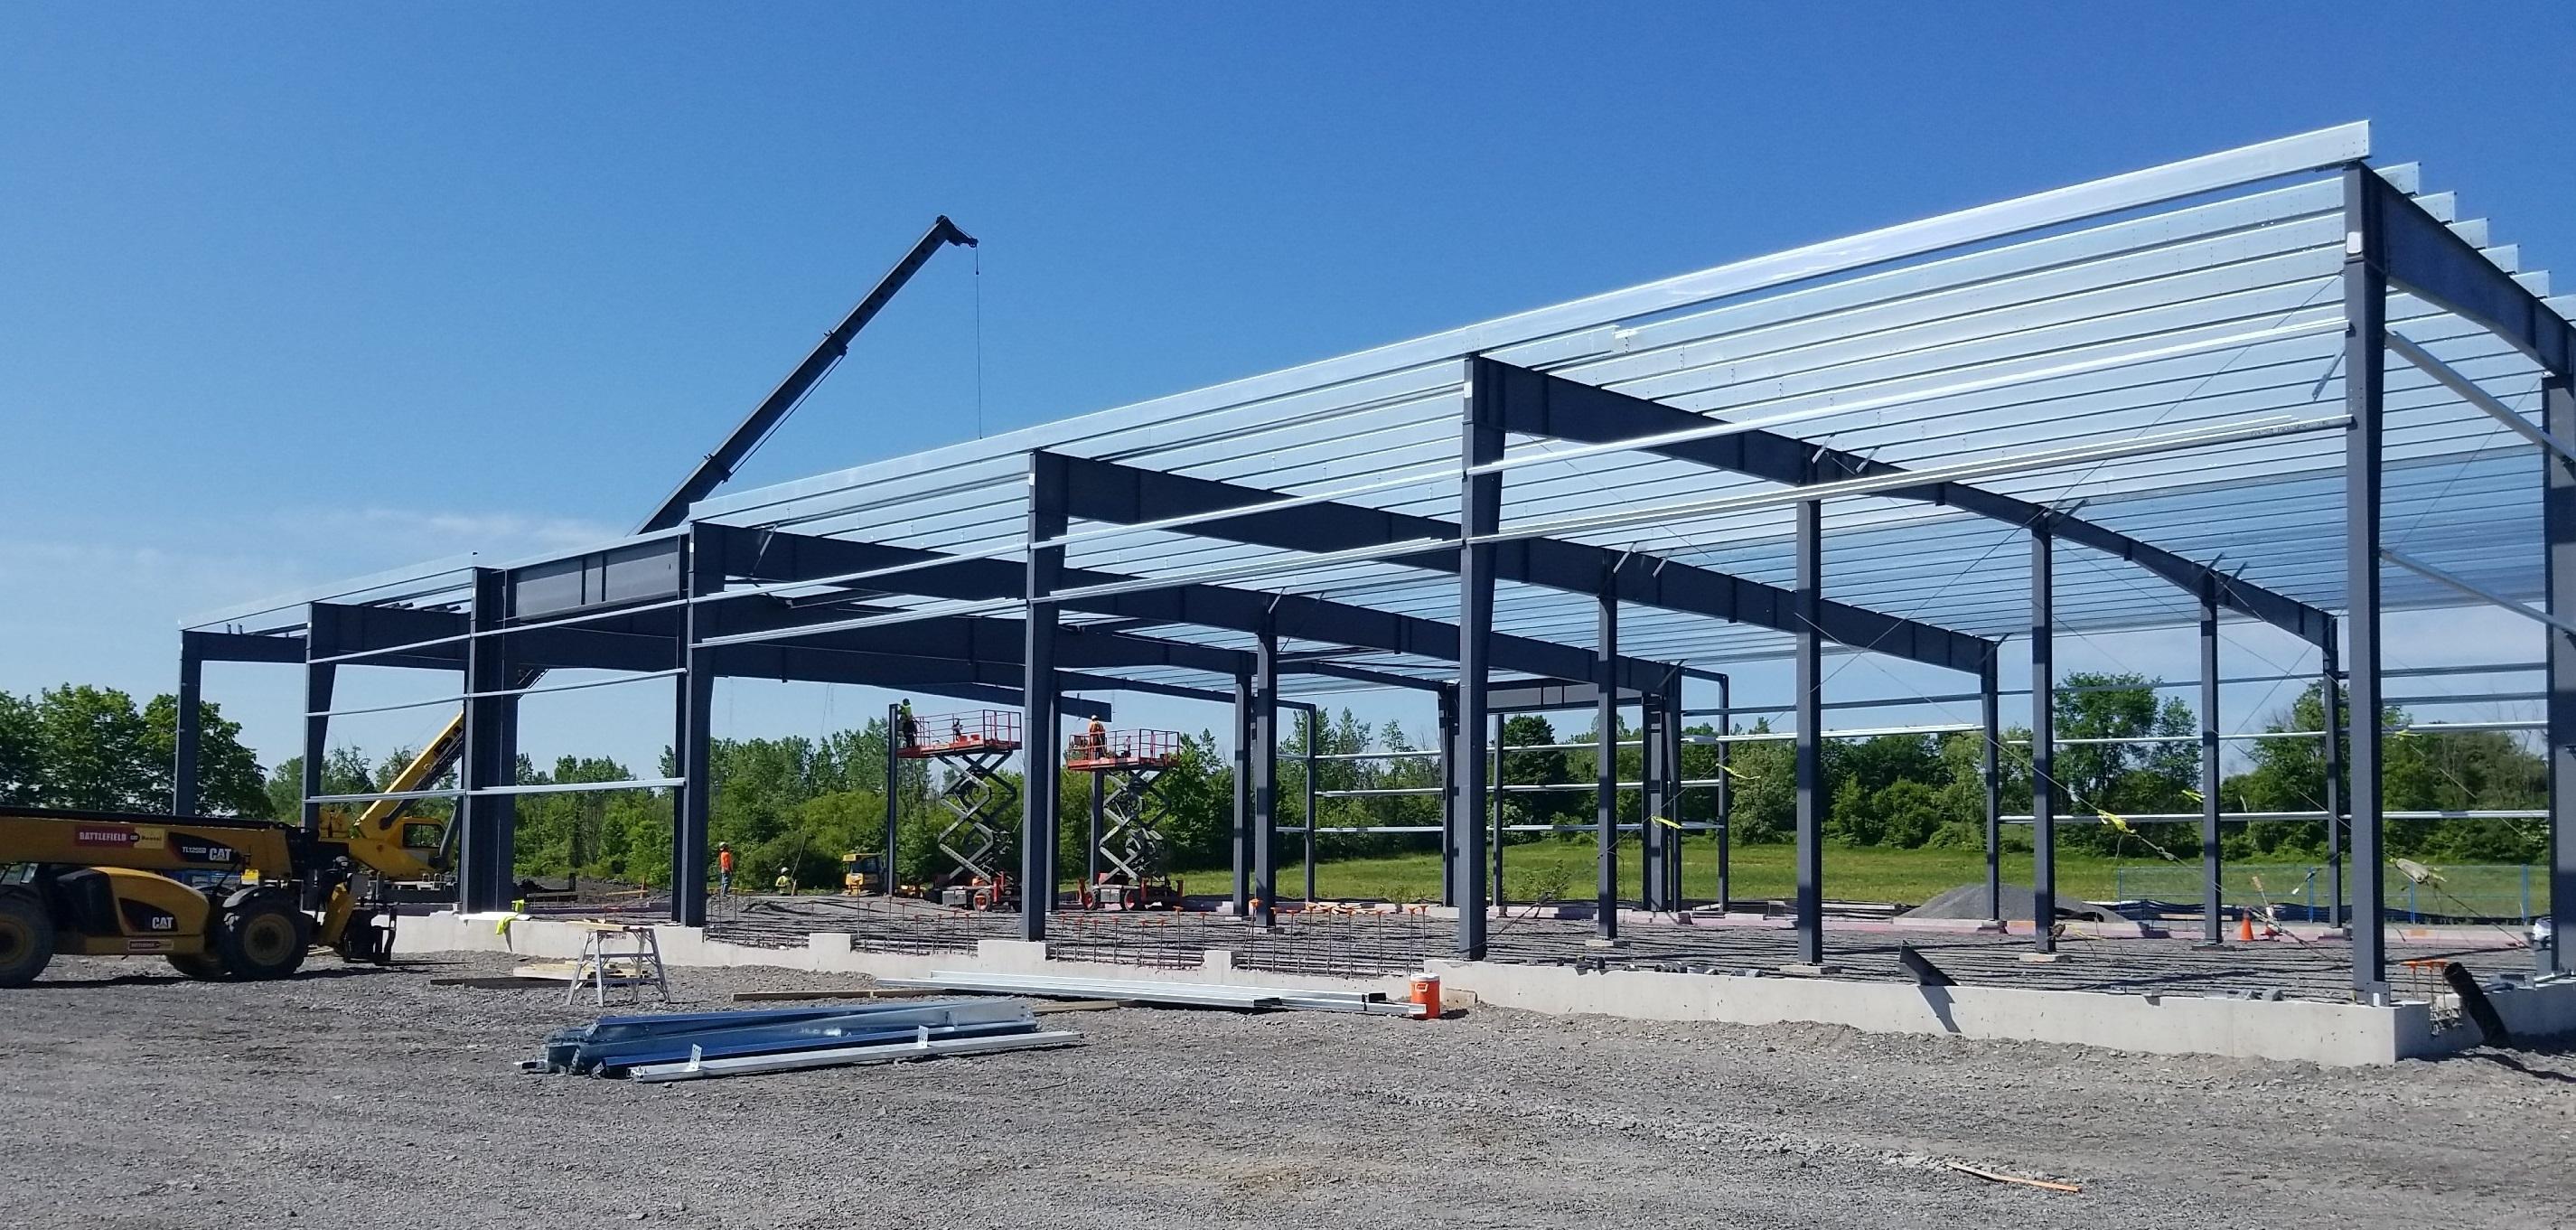 Myers Barrhaven Carstar – Butler Steel is Up!